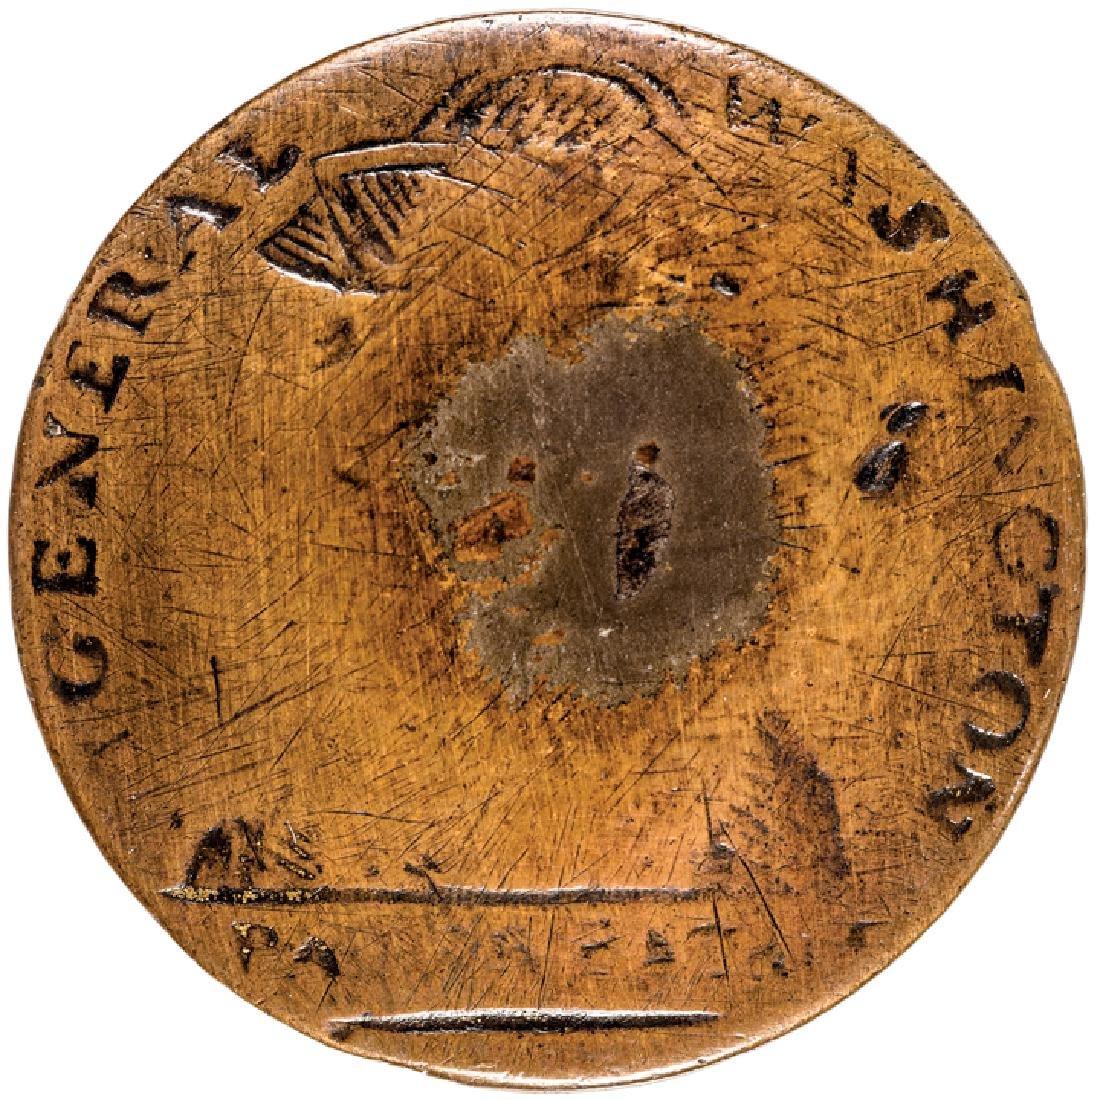 (1789) GENERAL WASHINGTON - PATER PATRIAE Button!